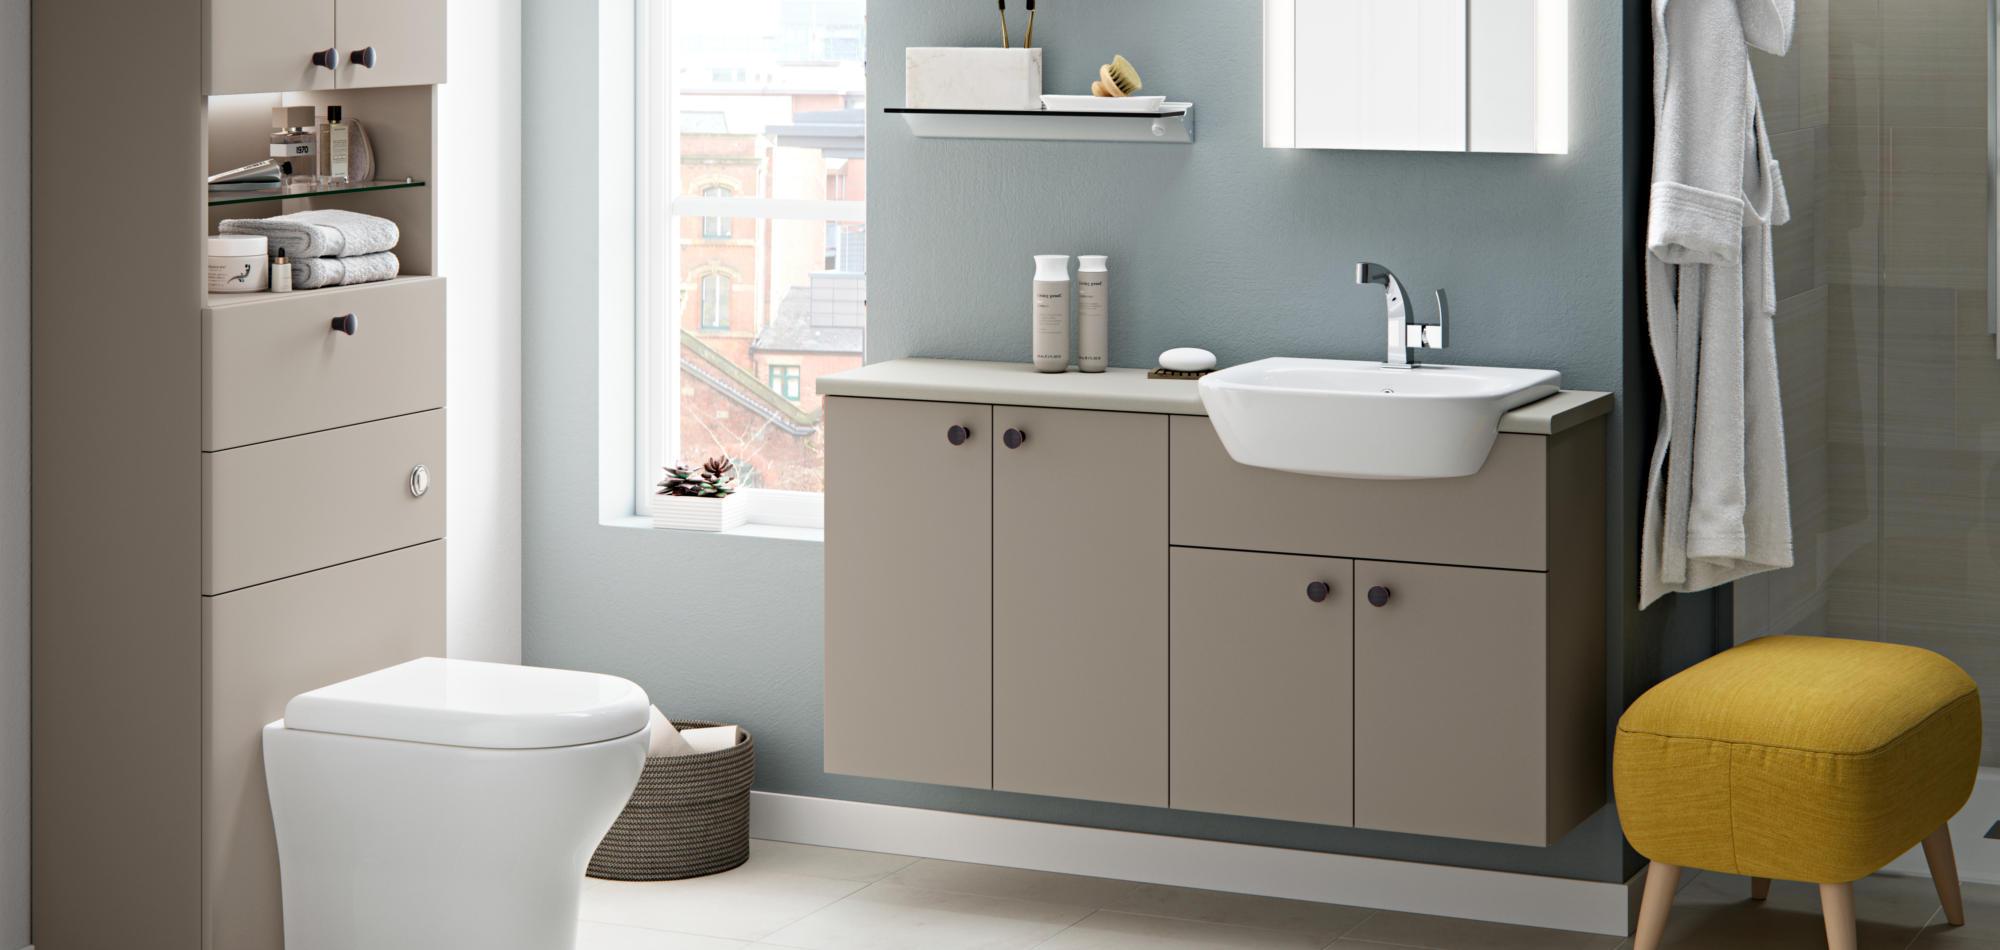 mereway bathrooms adriatic pumice matt